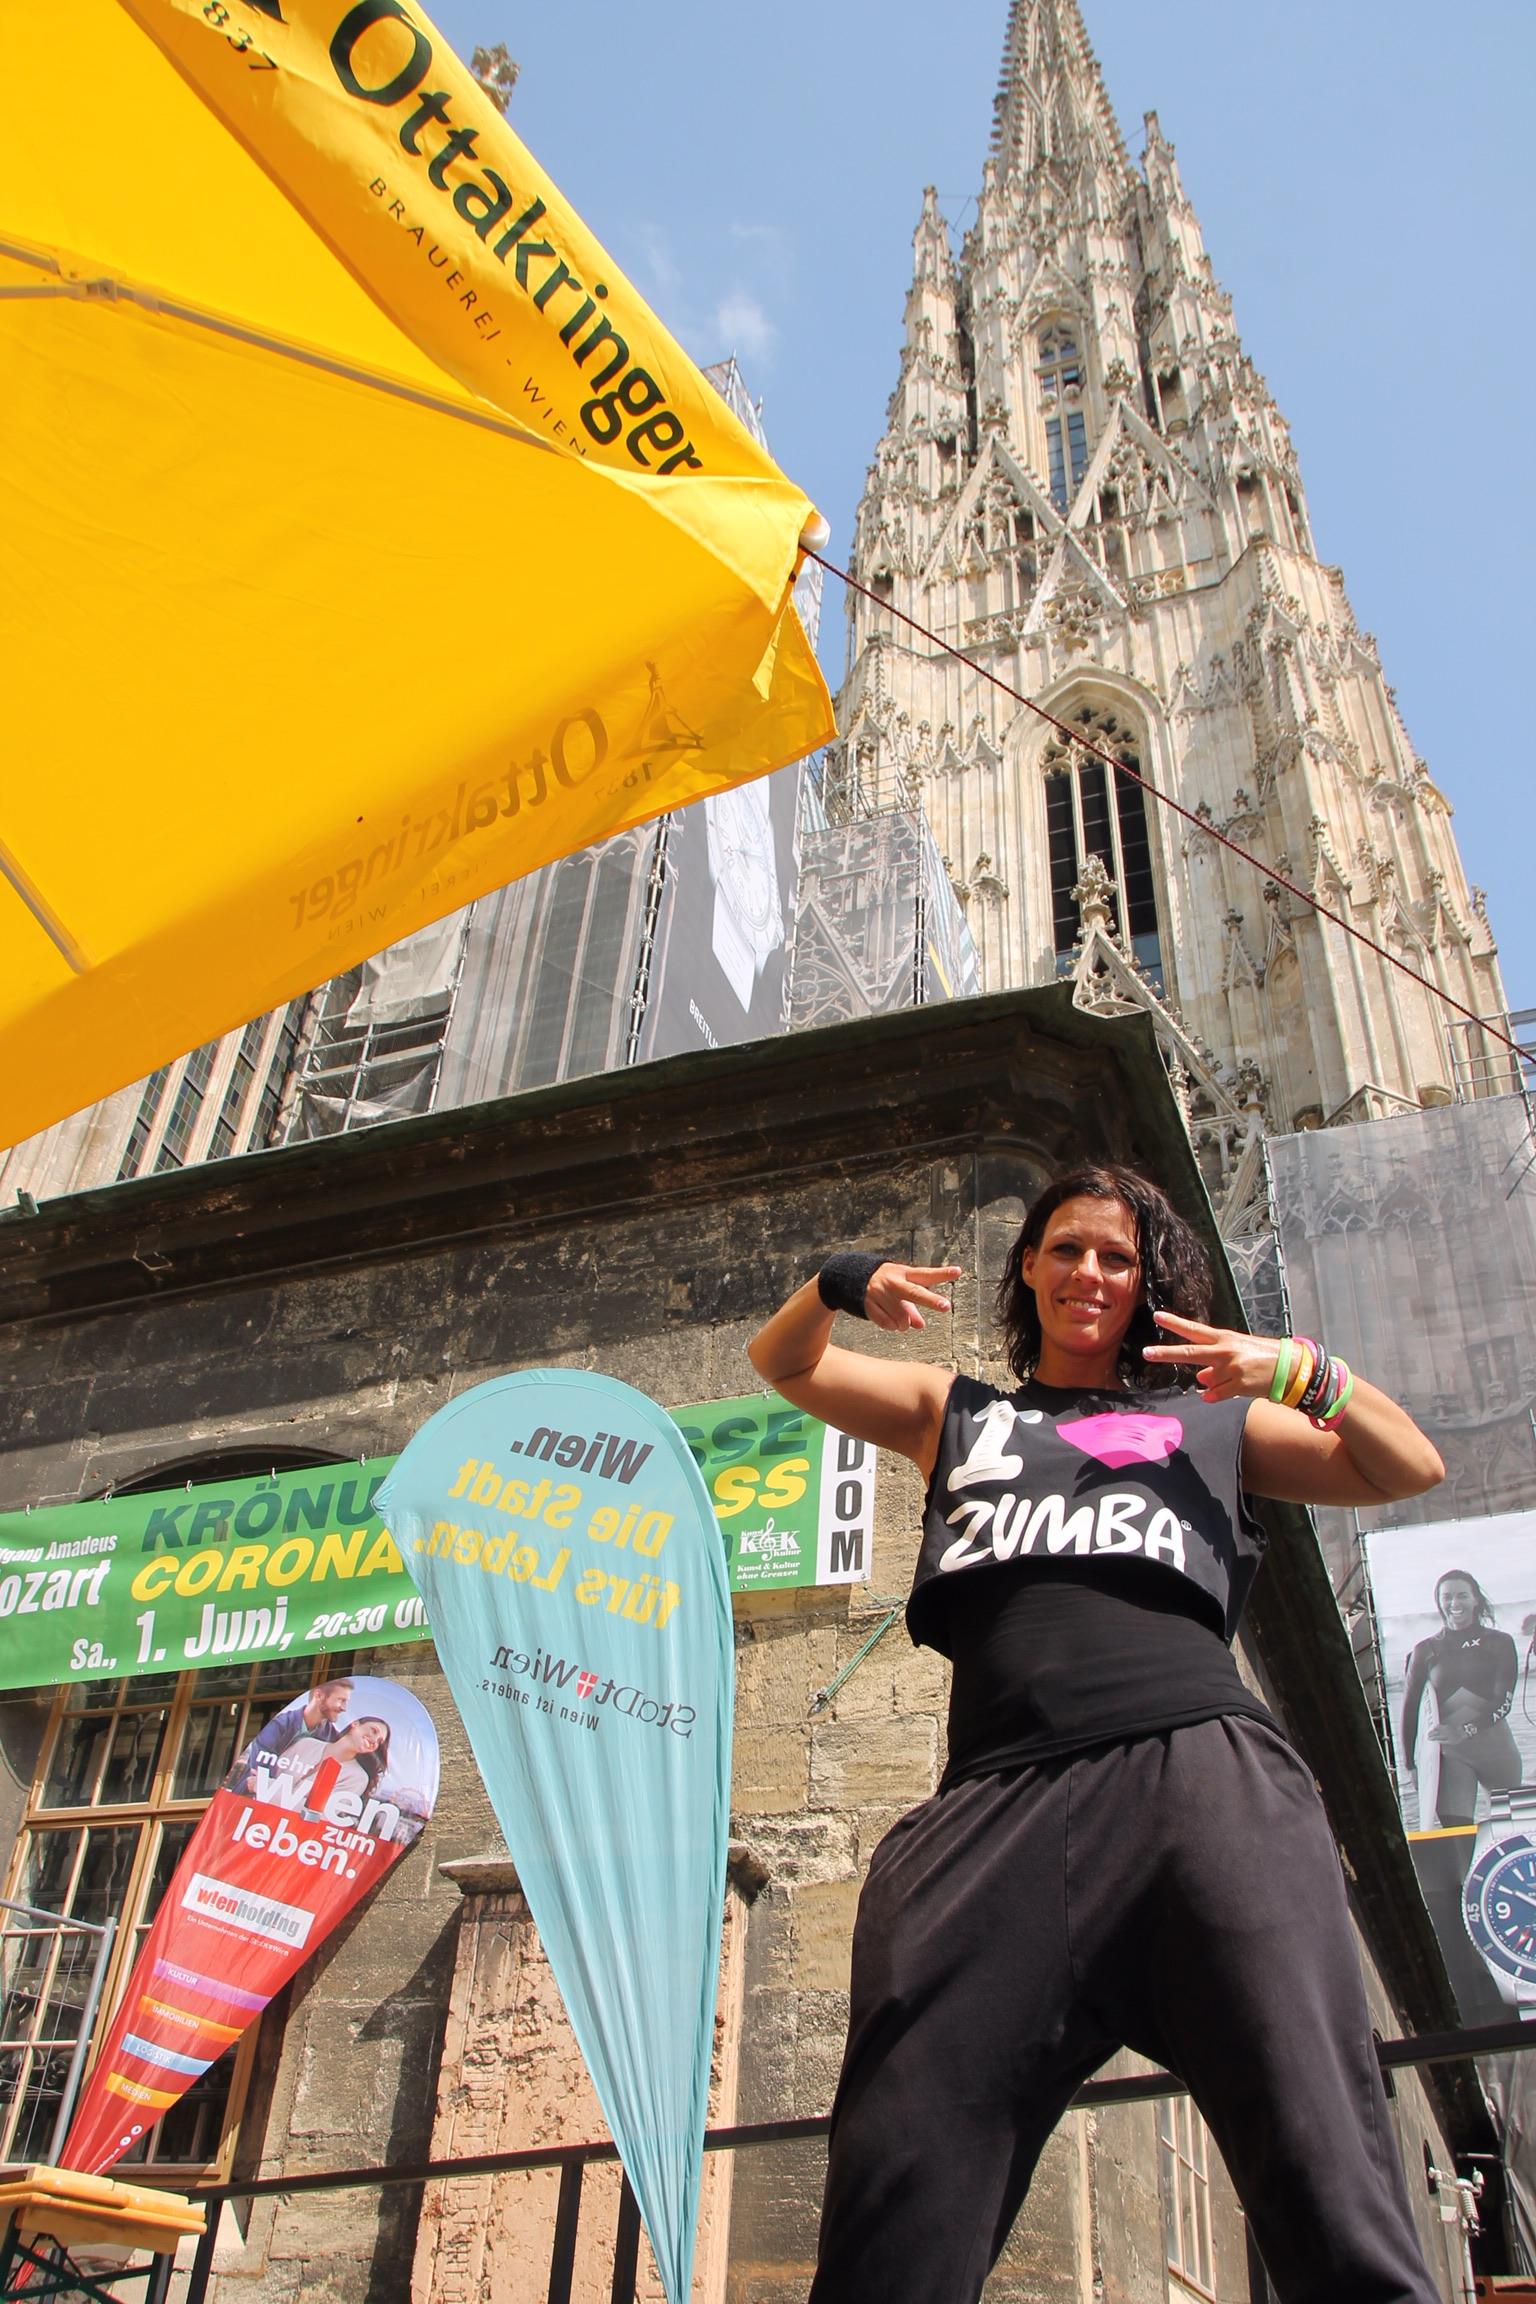 Zumba im Stephansdom Zumba am Kirtag Stephansplatz Manuela Bauer crazy-dance Zumba mit Manu